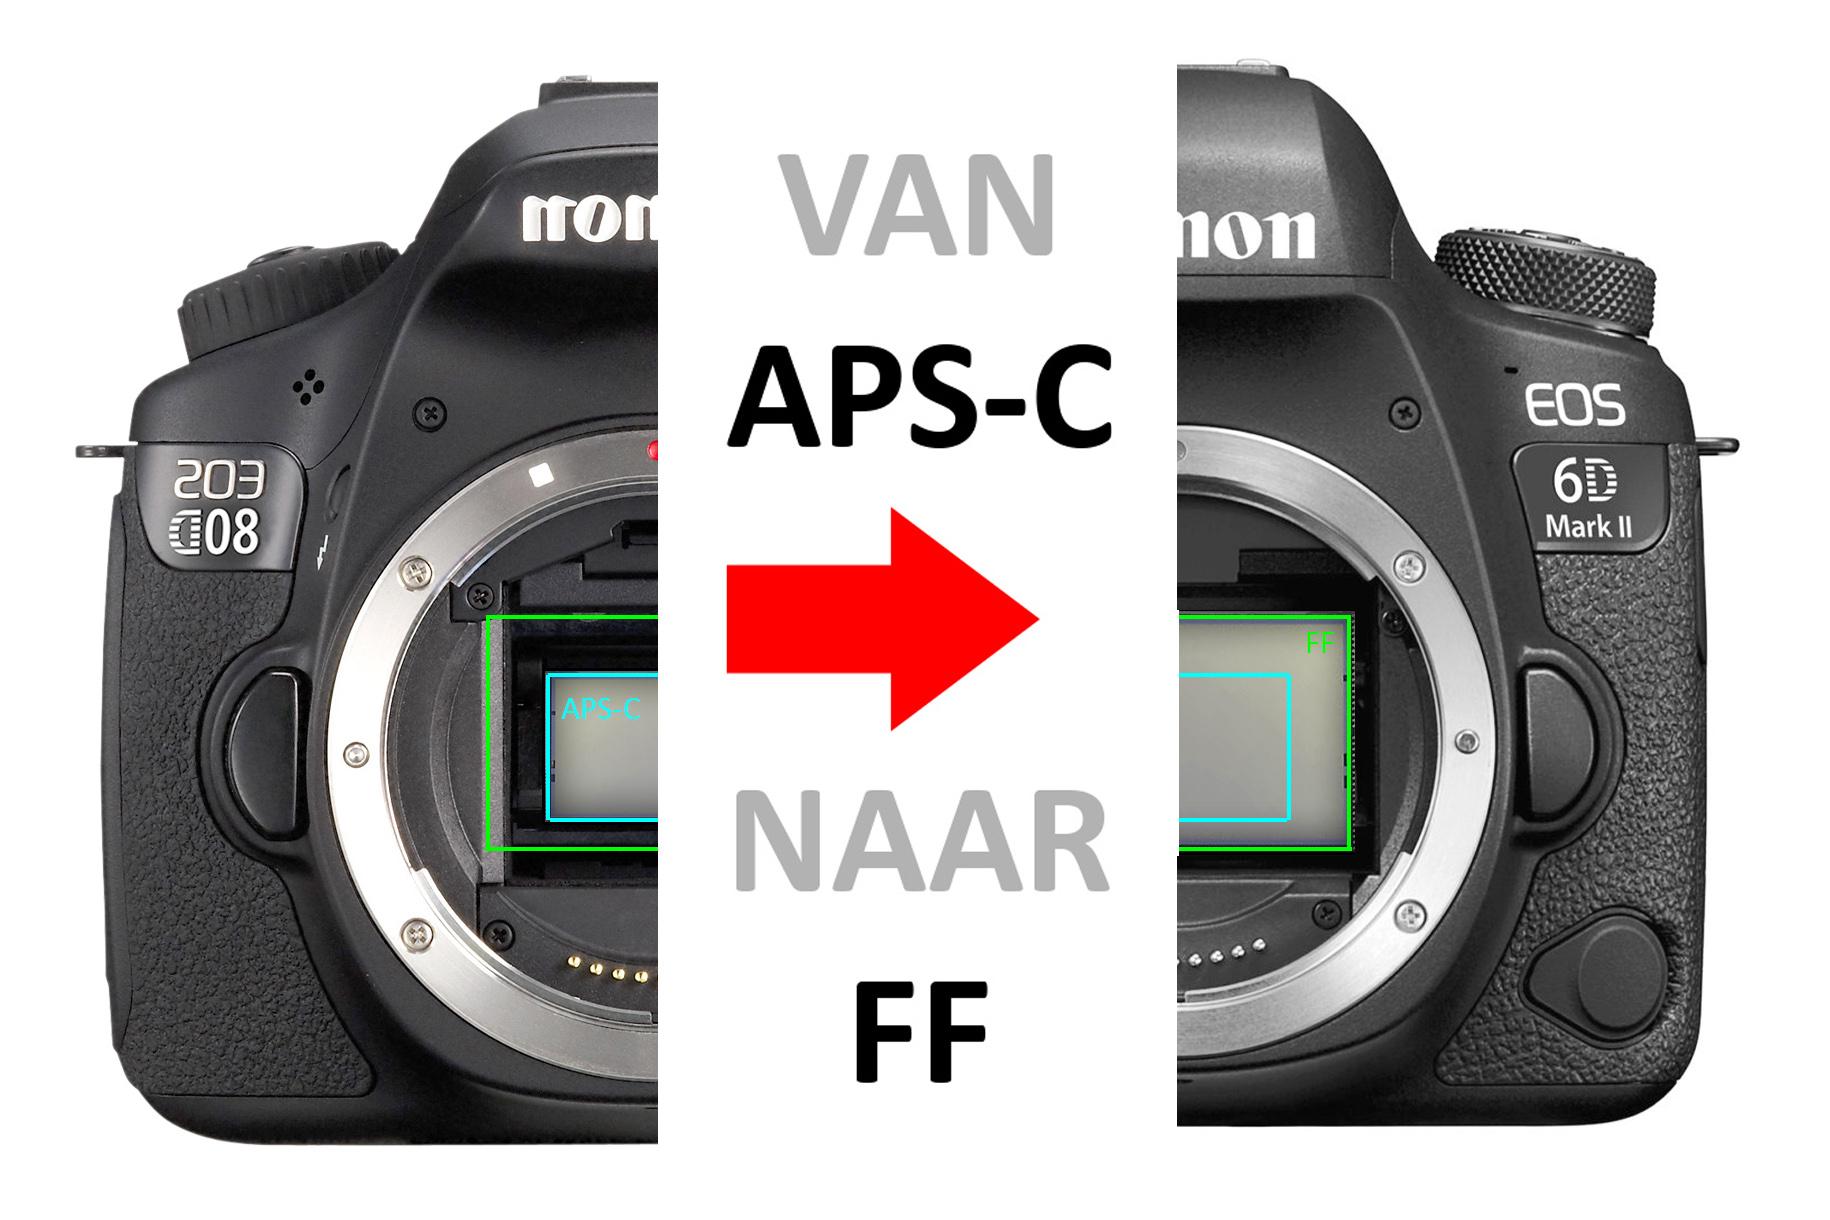 Van APS-C naar full-frame